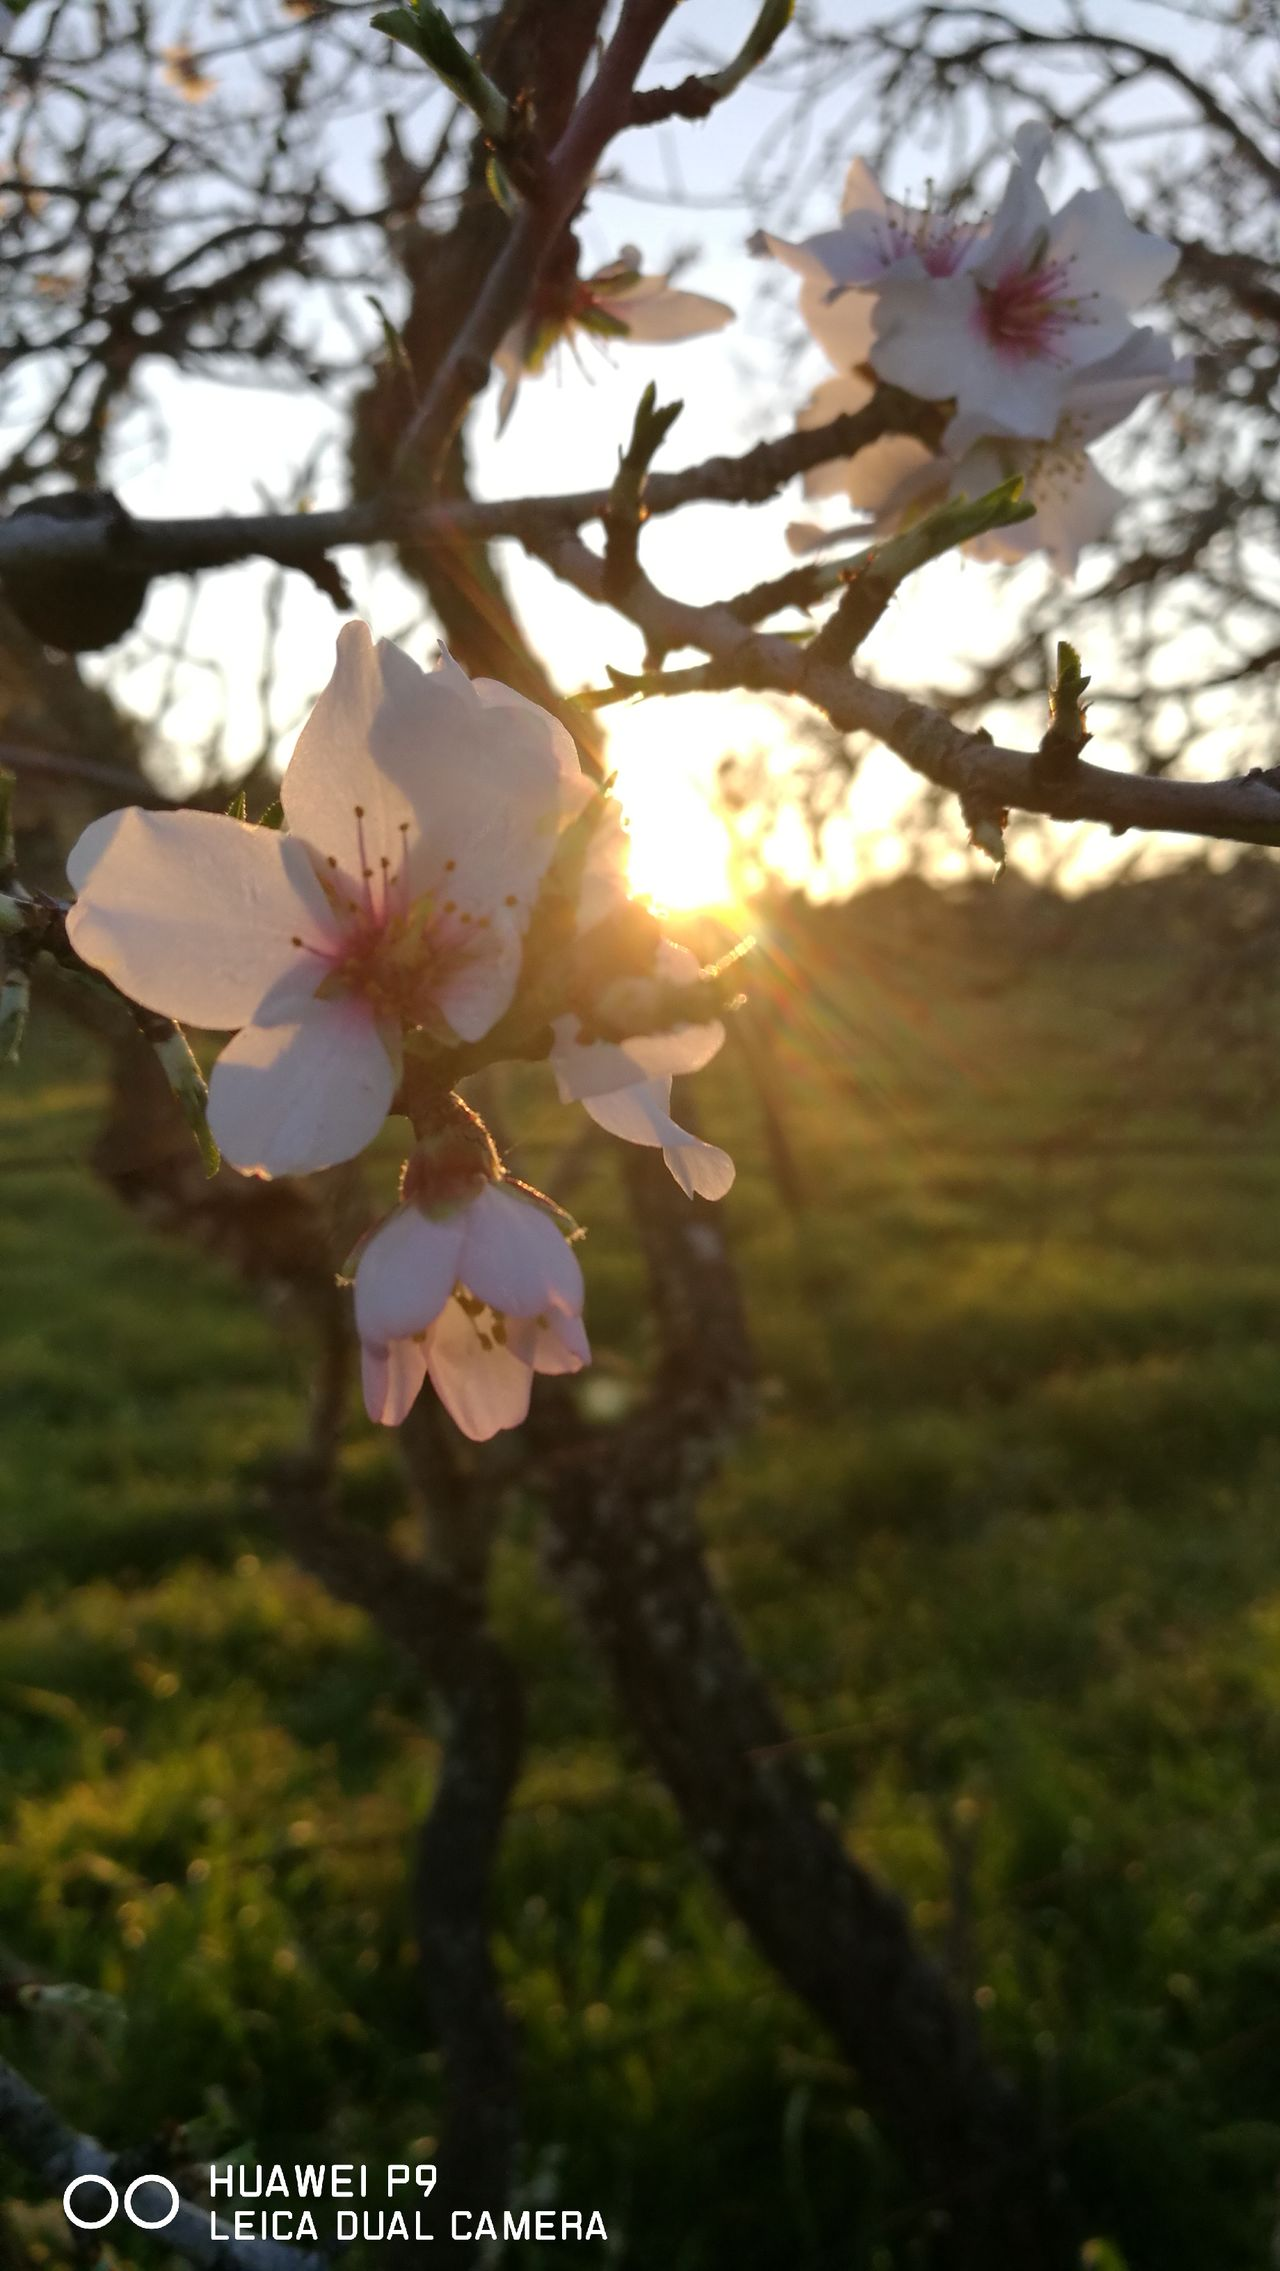 Mandelbaumblüte bei Sonnenuntergang auf Mallorca... Nature Tree Sunlight Growth Beauty In Nature Outdoors Sunset Sunbeam Tranquil Scene Nostalgic Scene PalmaDiMaiorca GetbetterwithAlex Originalpicture